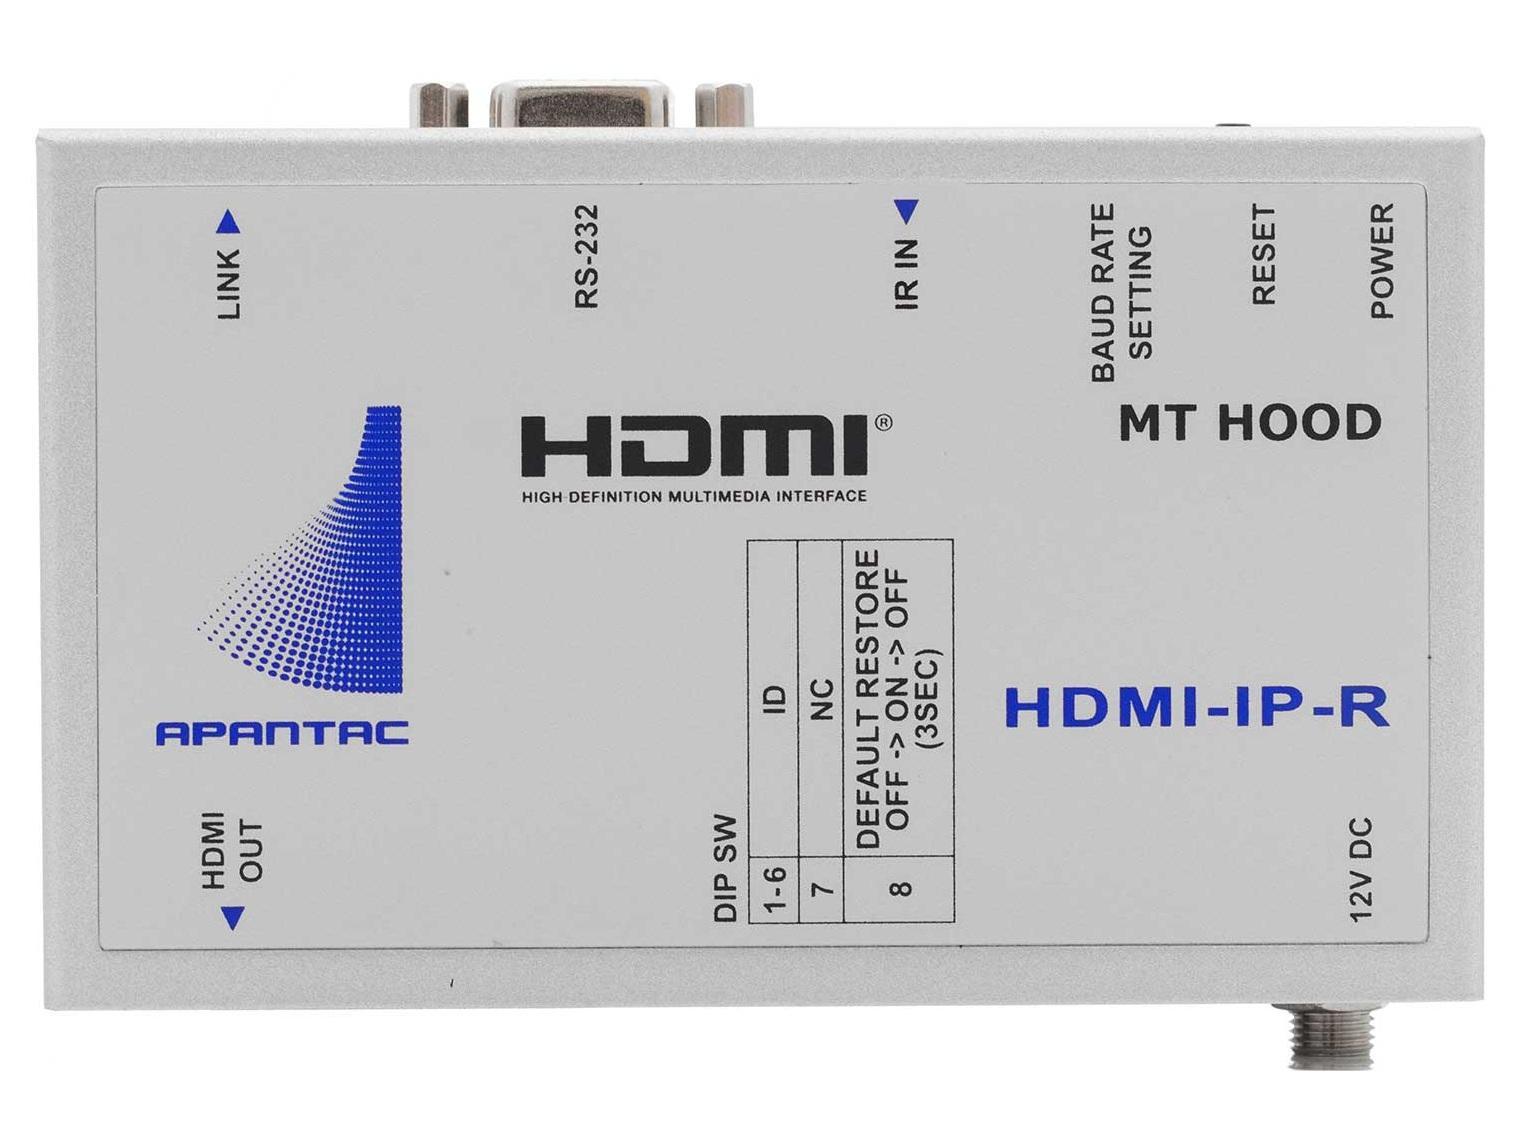 Details about Apantac HDMI-IP-R HDMI Extender (Receiver) RS232/IR/Gigabit  Ethernet Network